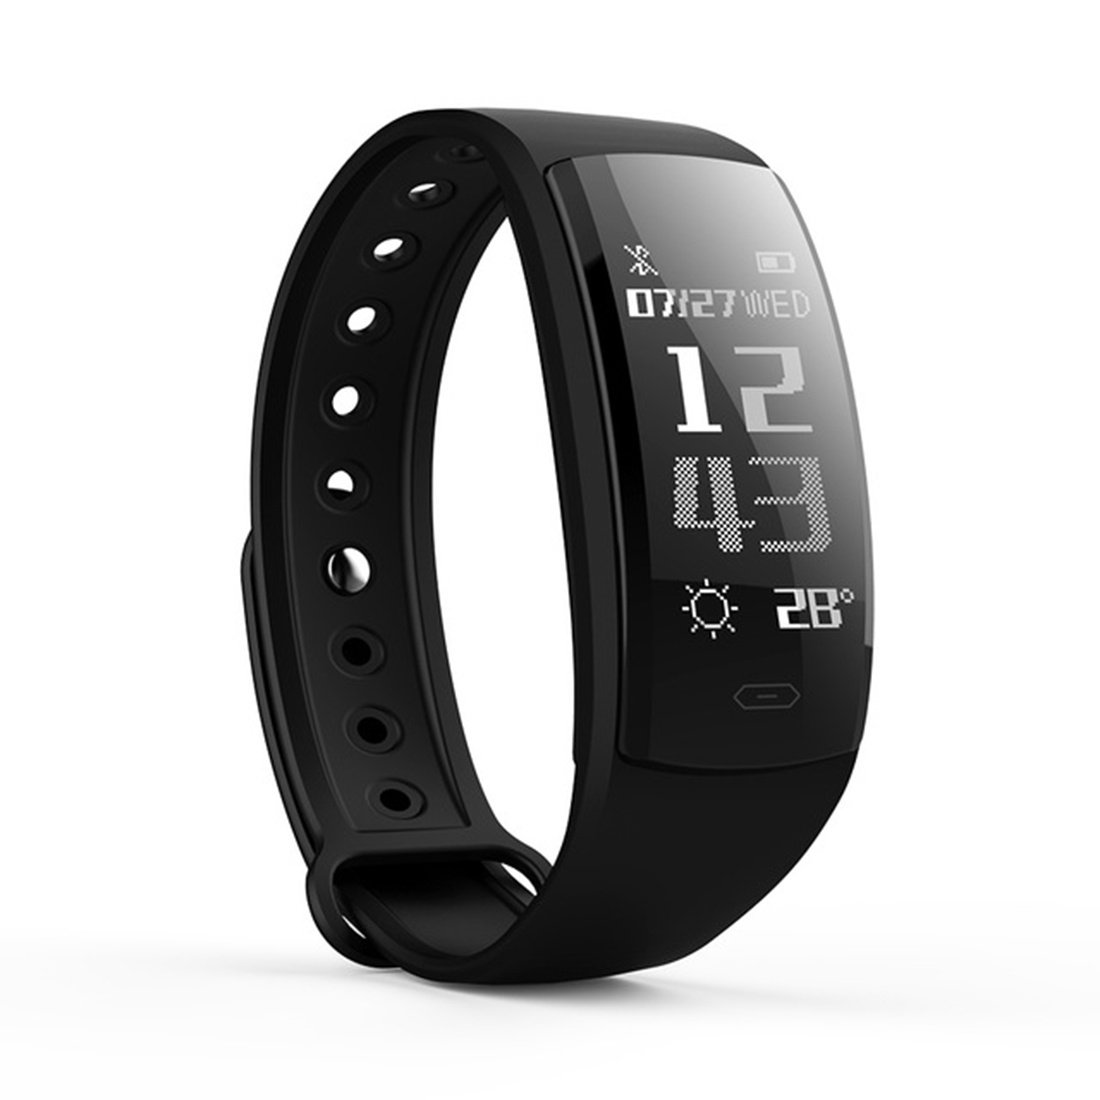 PINCHU QS90 Smart Wristbands Fitness Bracelet Blood Pressure Smart Bracelets Heart Rate Monitor Fitness Bracelet Band Waterproof, E